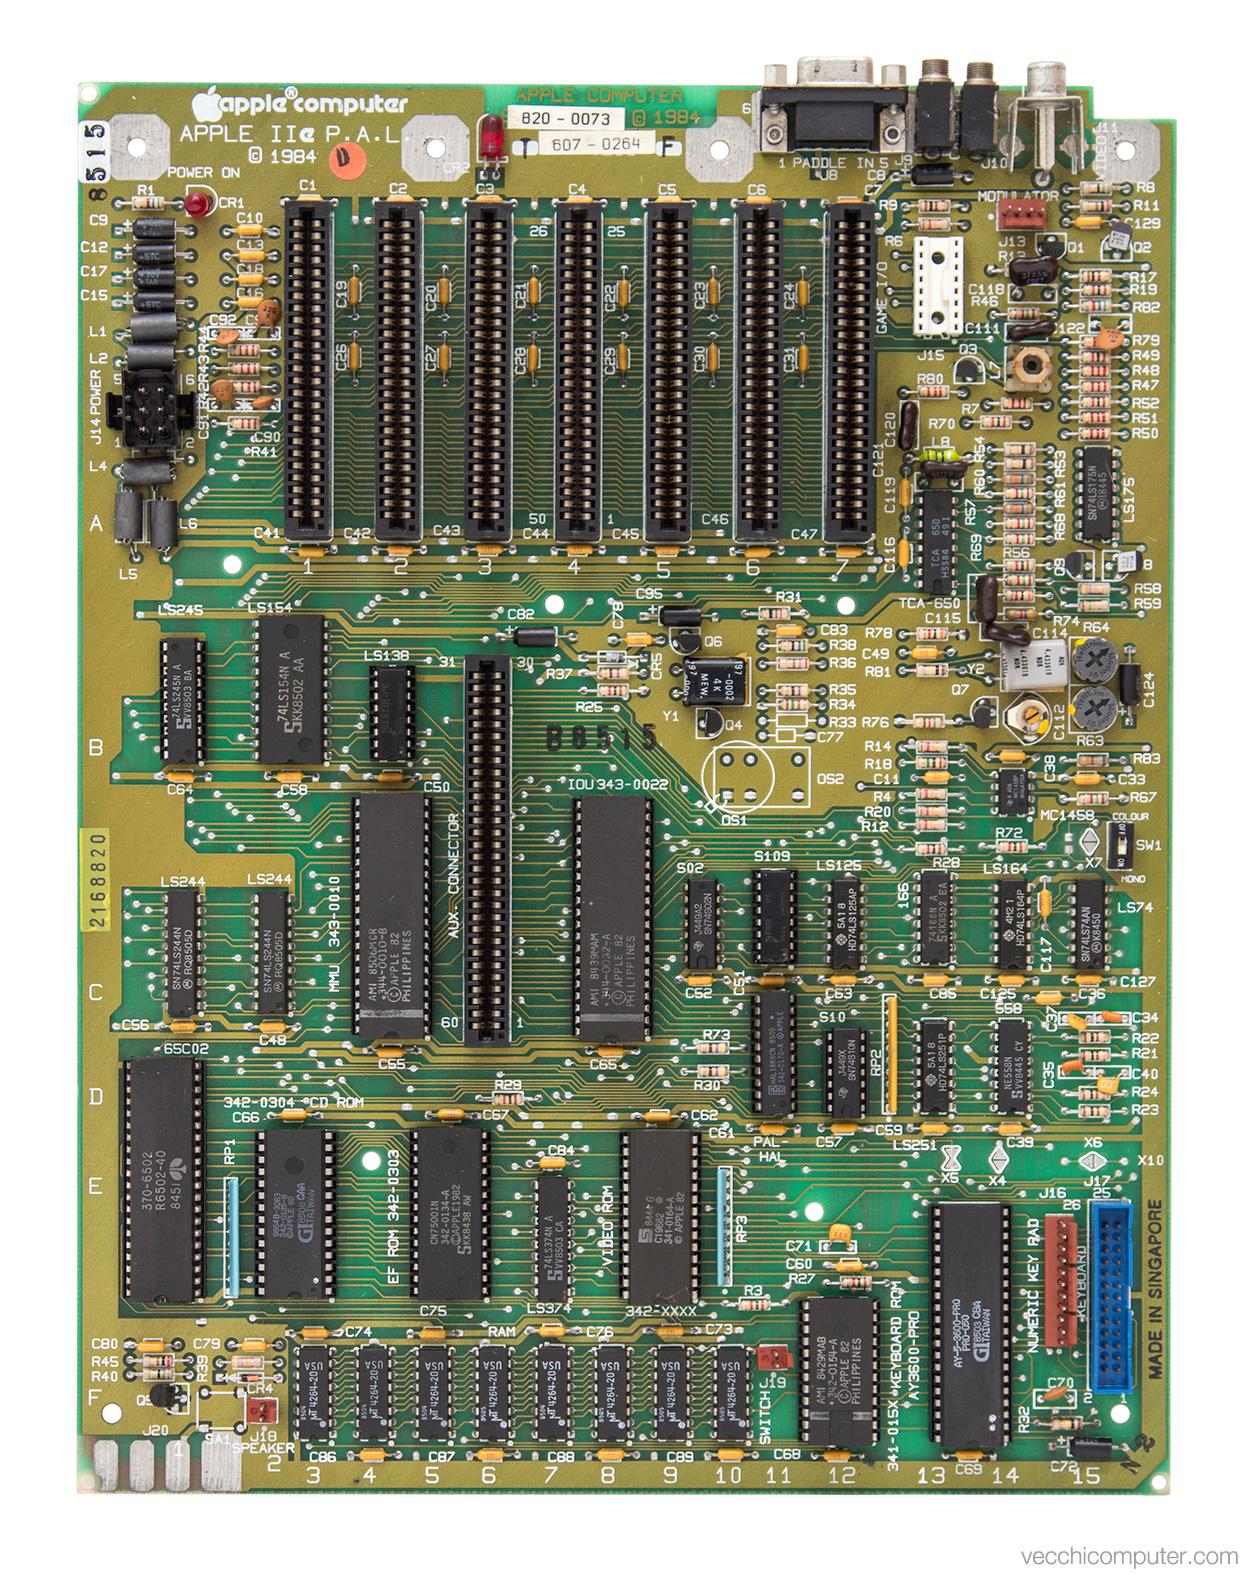 Apple IIe - scheda madre PAL